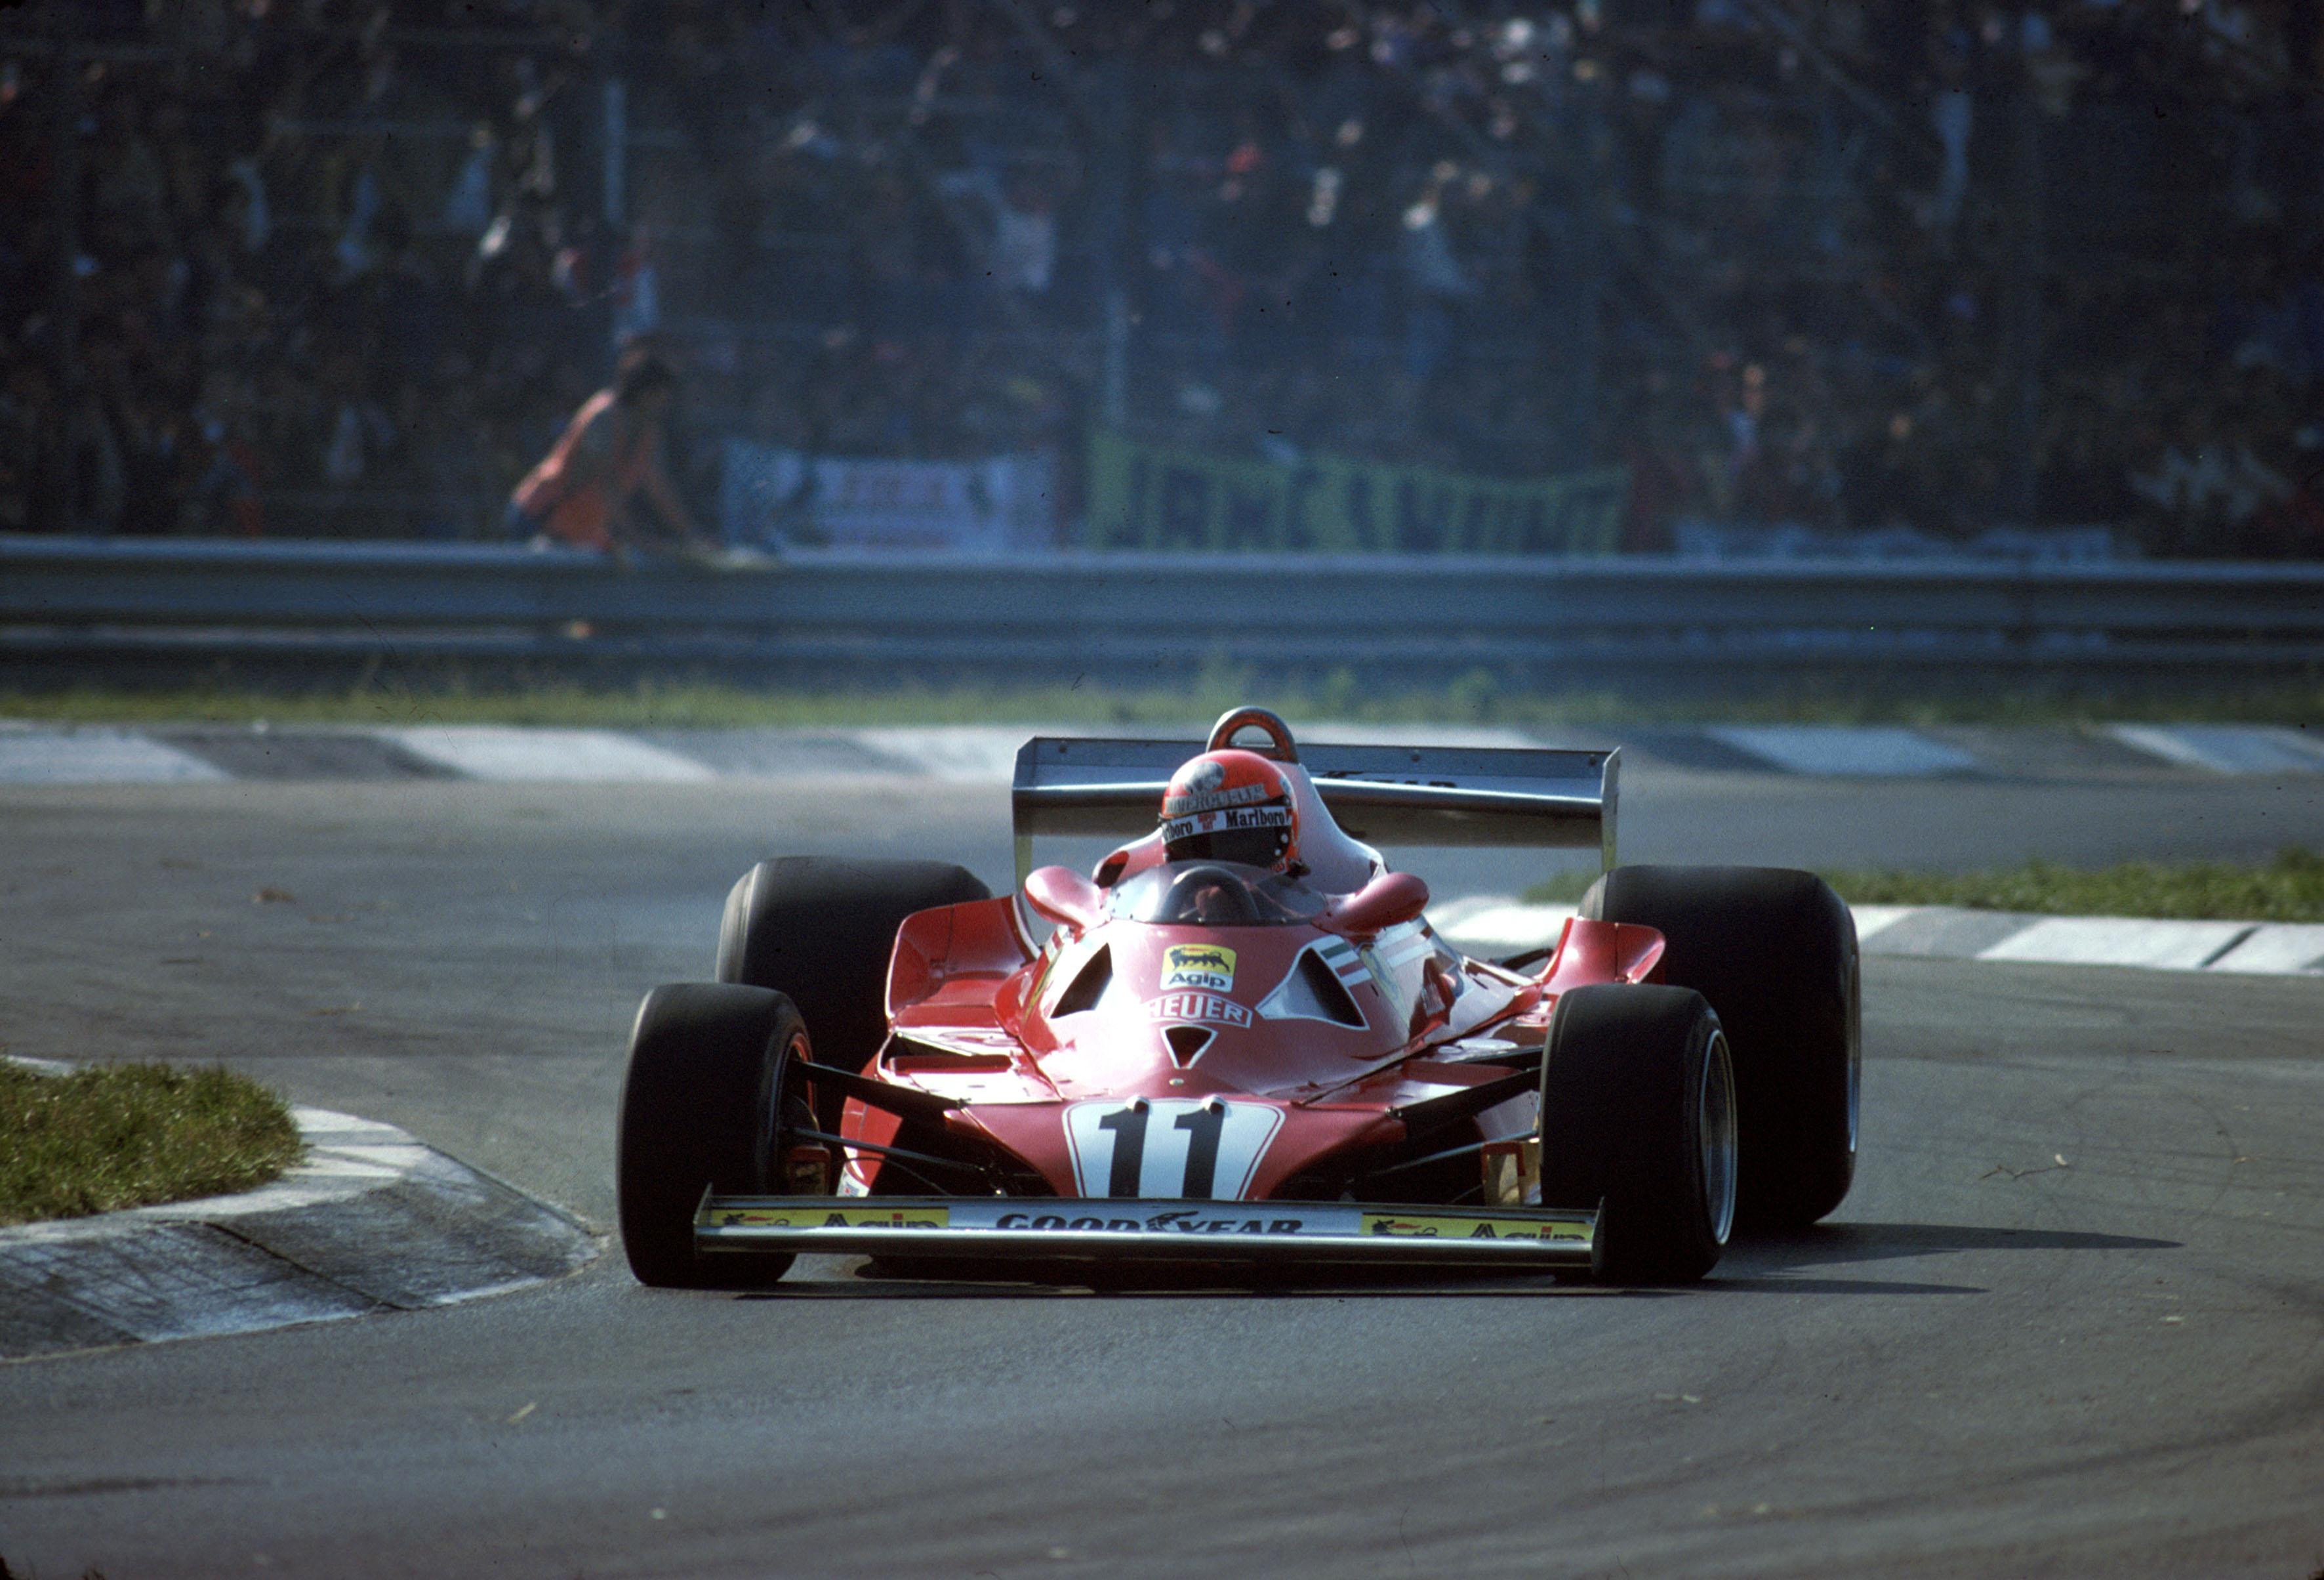 Niki Lauda Or